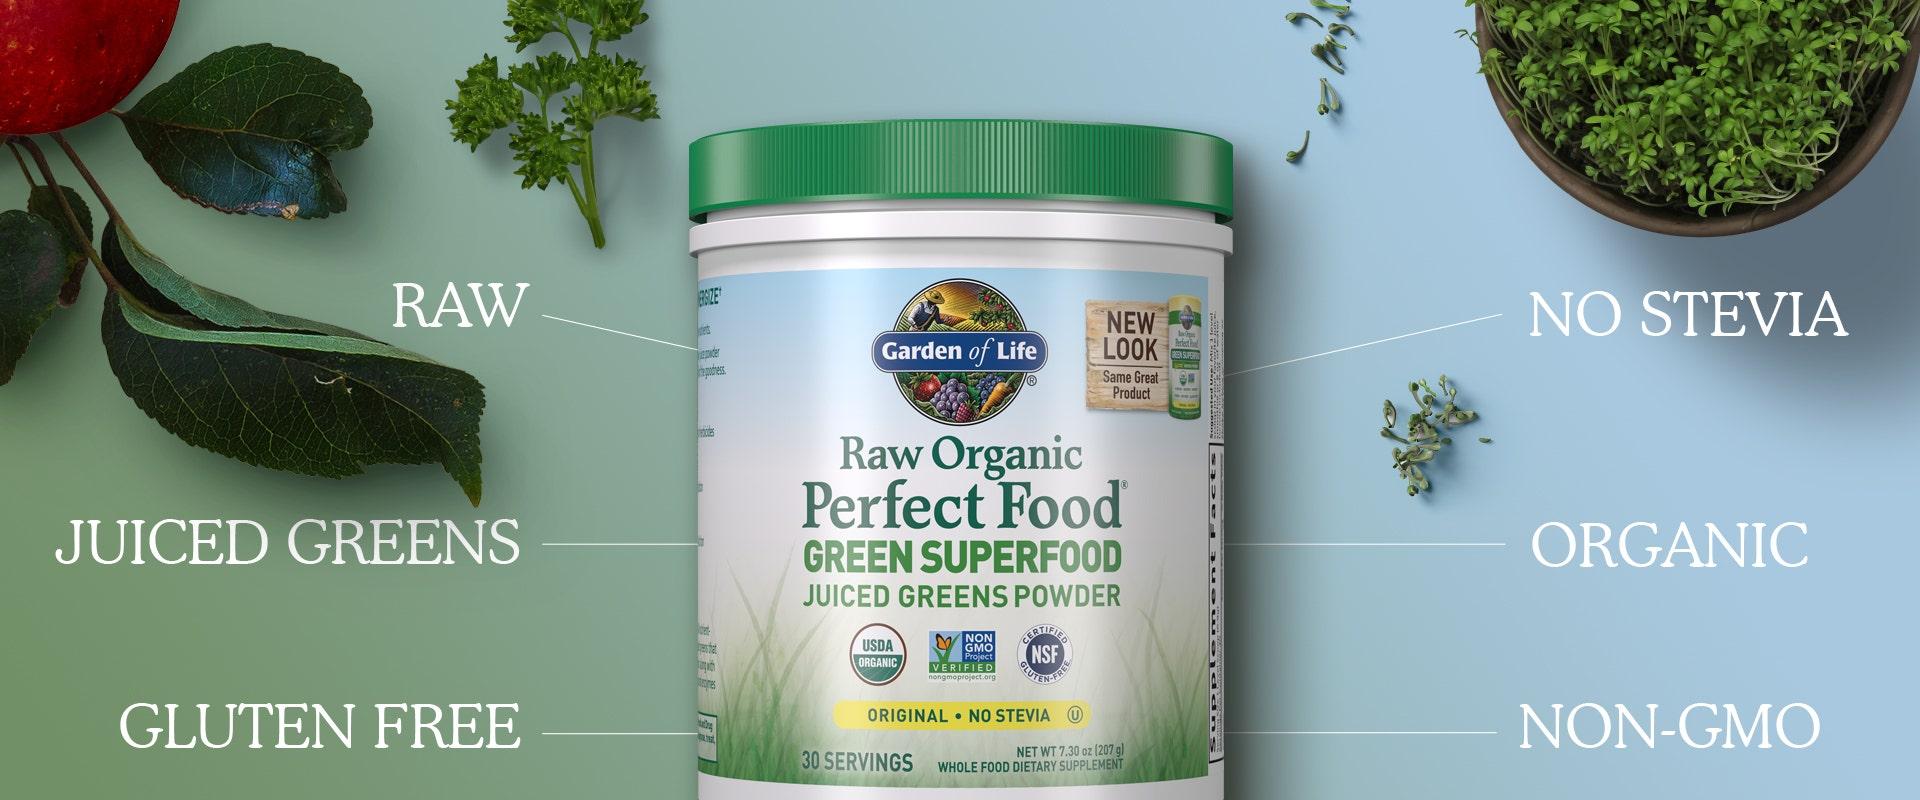 Raw Organic Perfect Food by Garden of Life myKind Organics